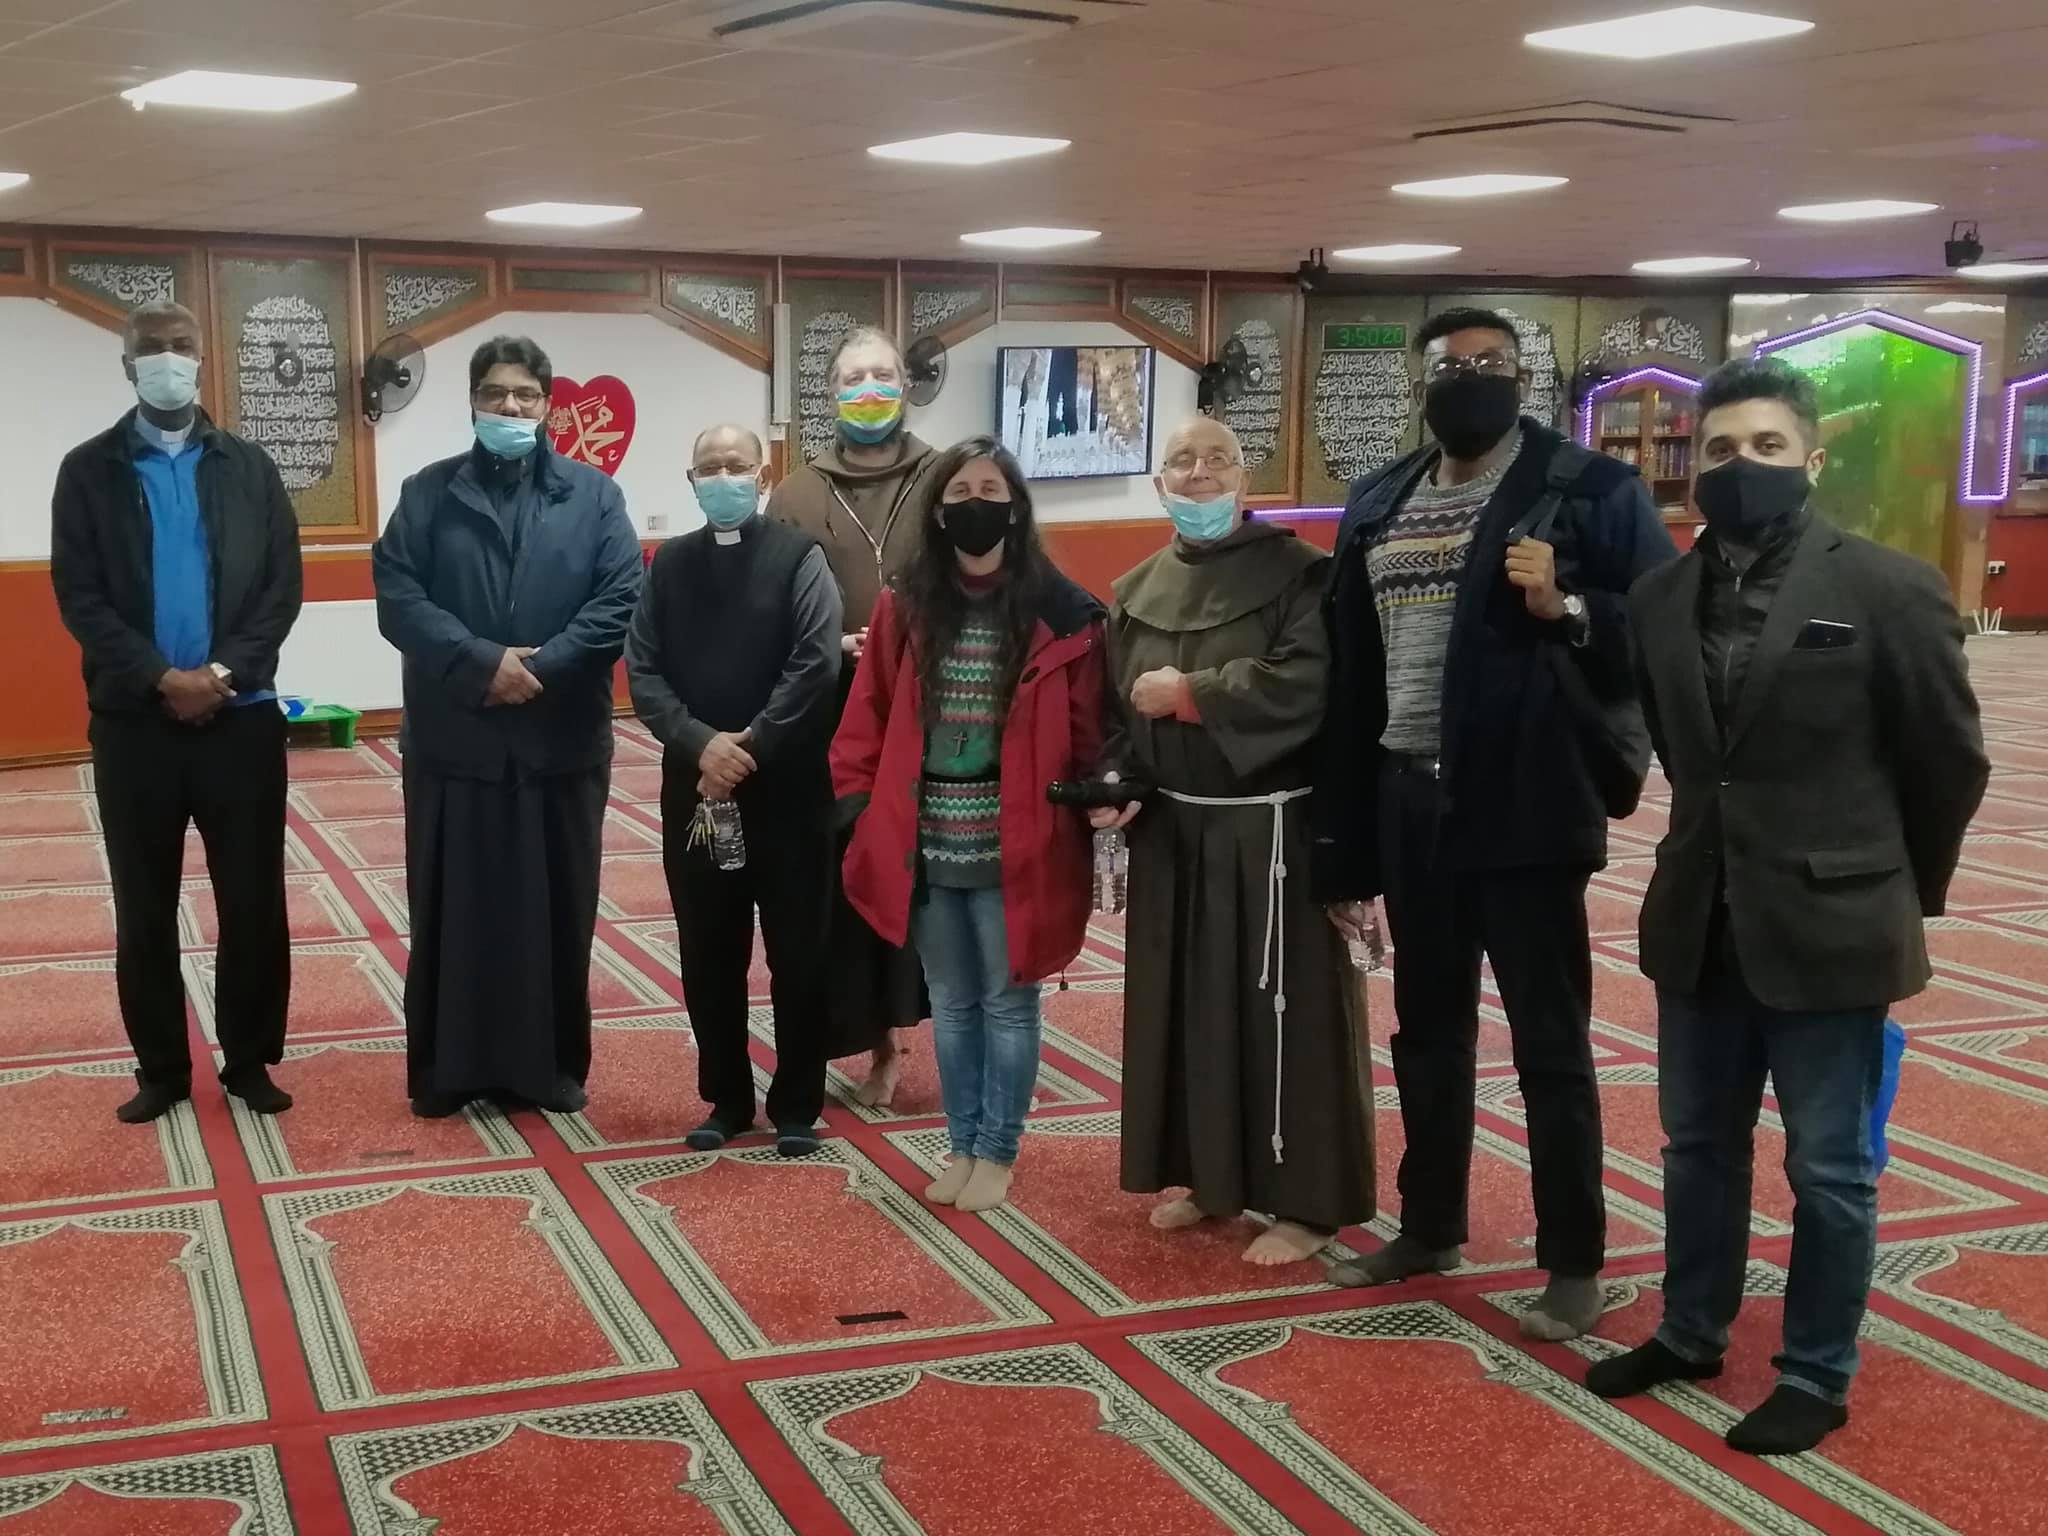 Plaistow Brothers Enjoy Interfaith Dialogue